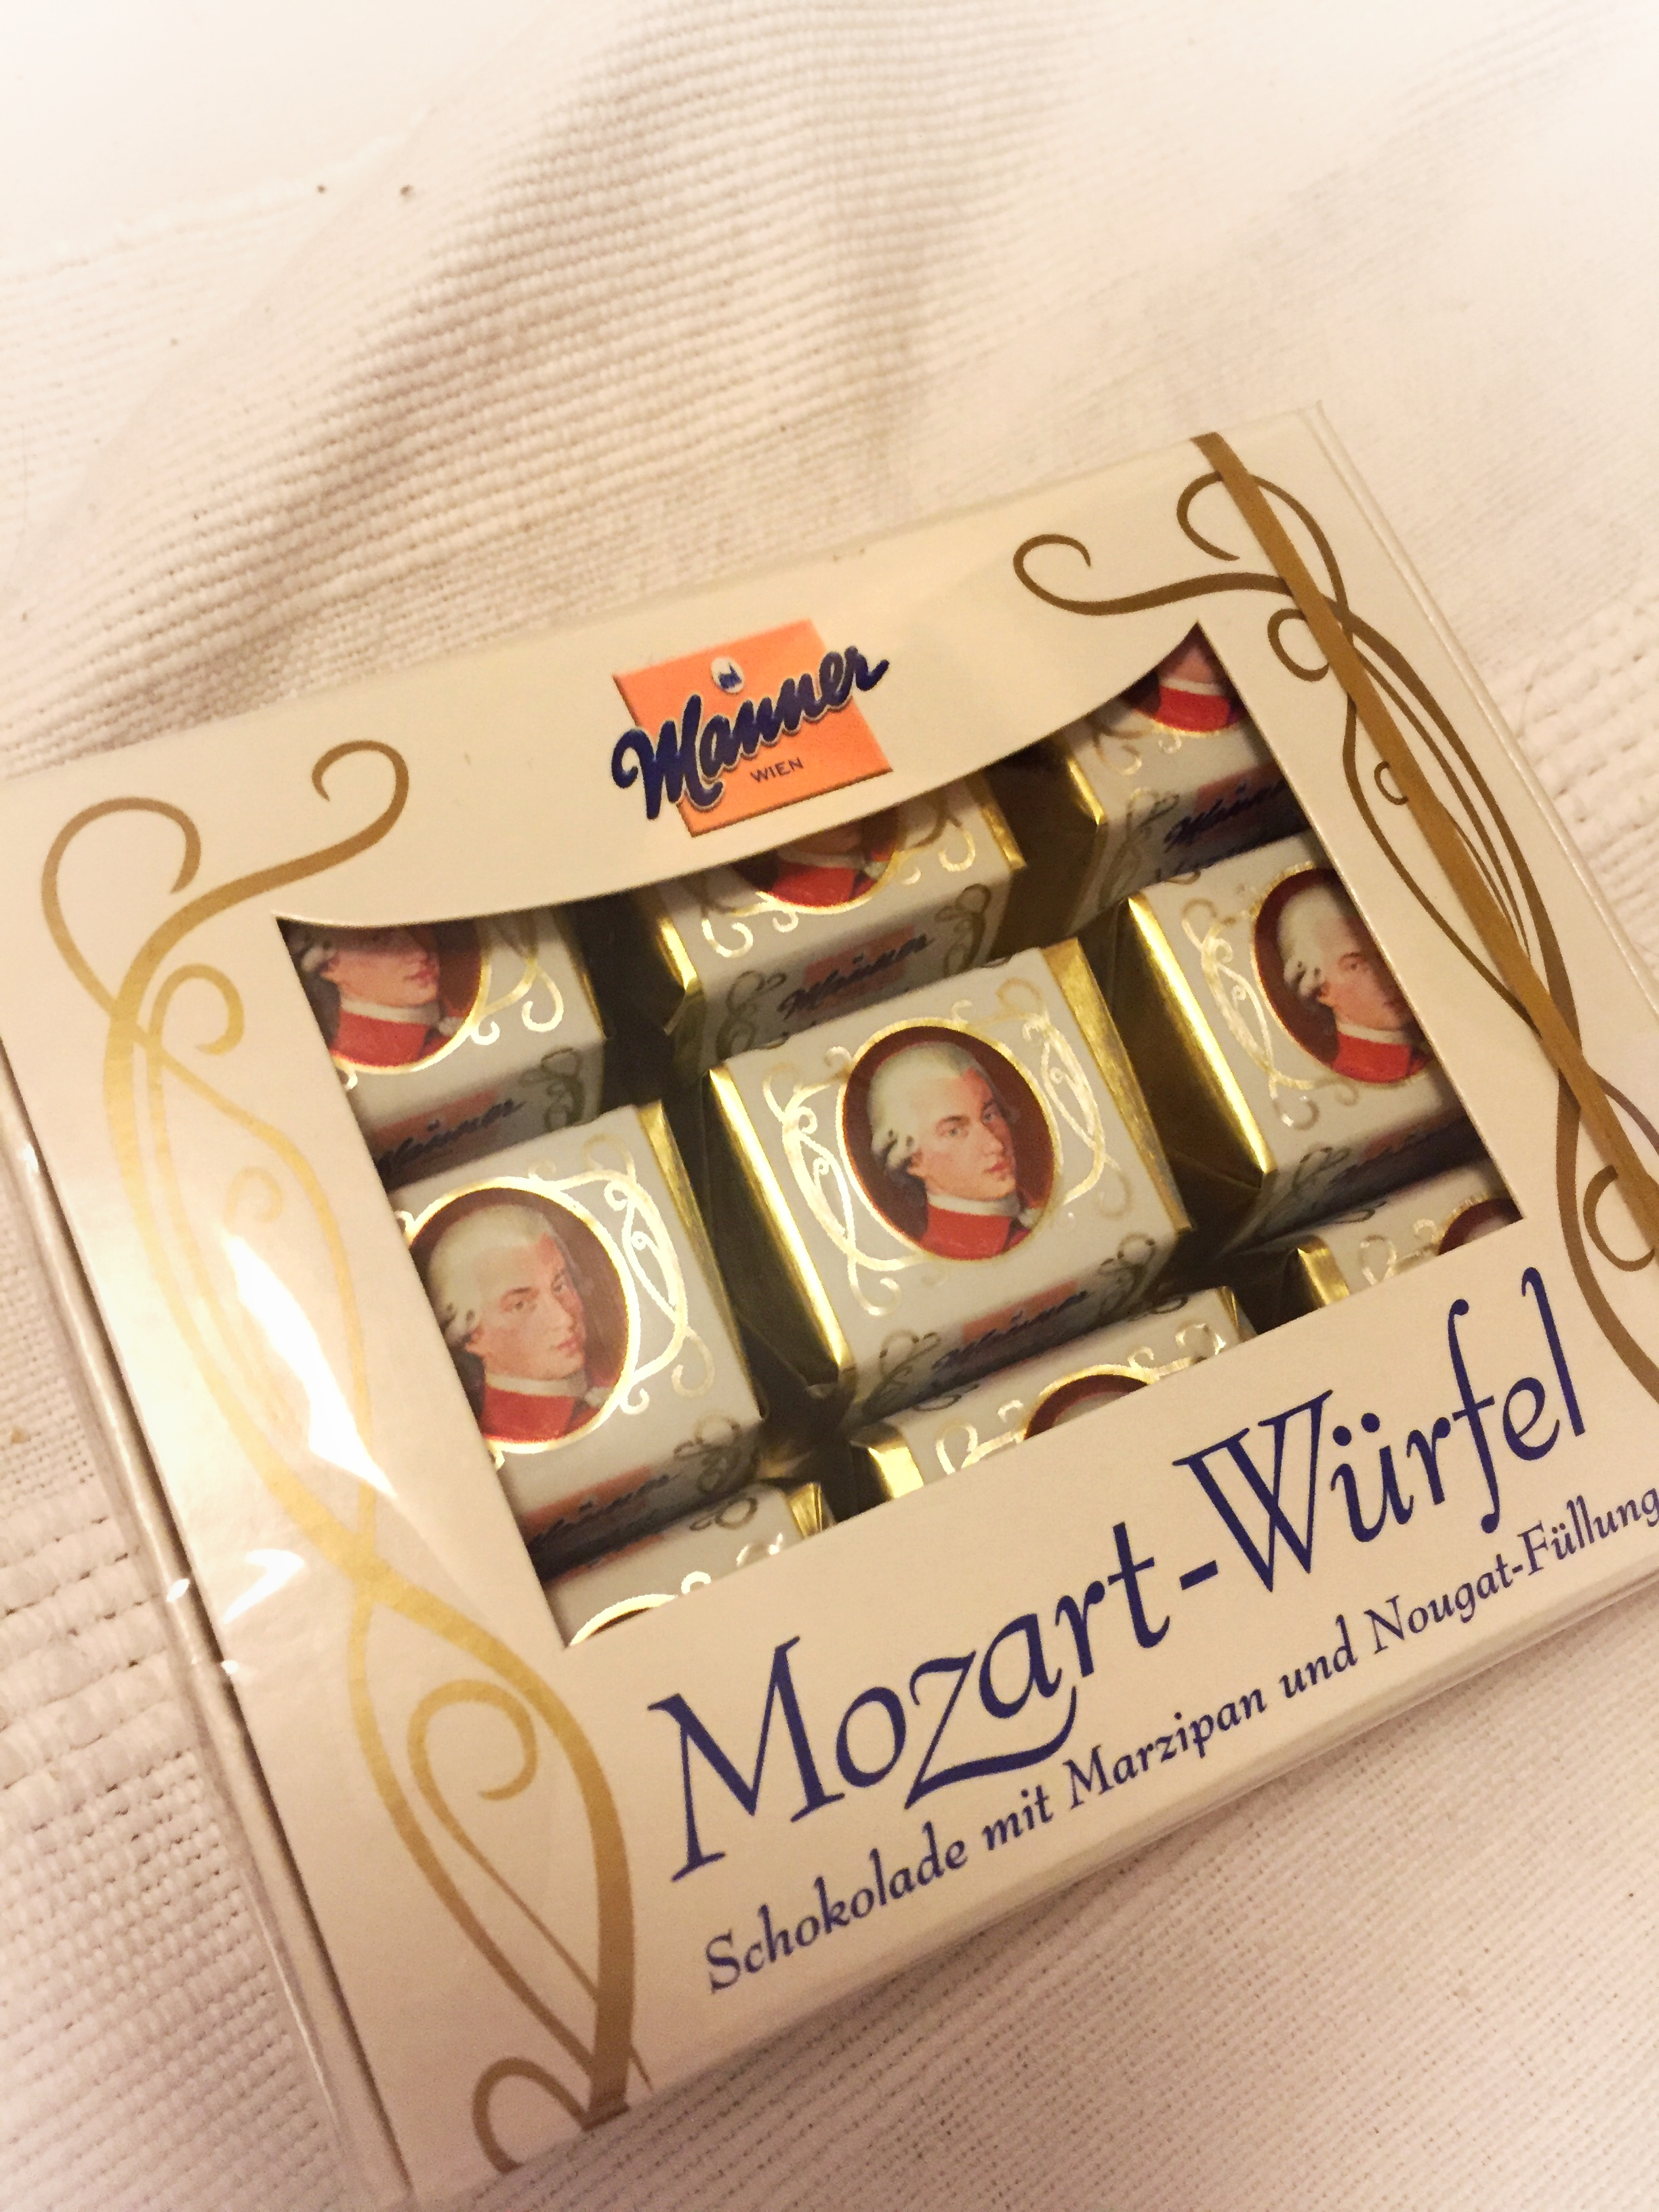 local Manner Mozart-Würfel marzipan chocolates (Vienna)